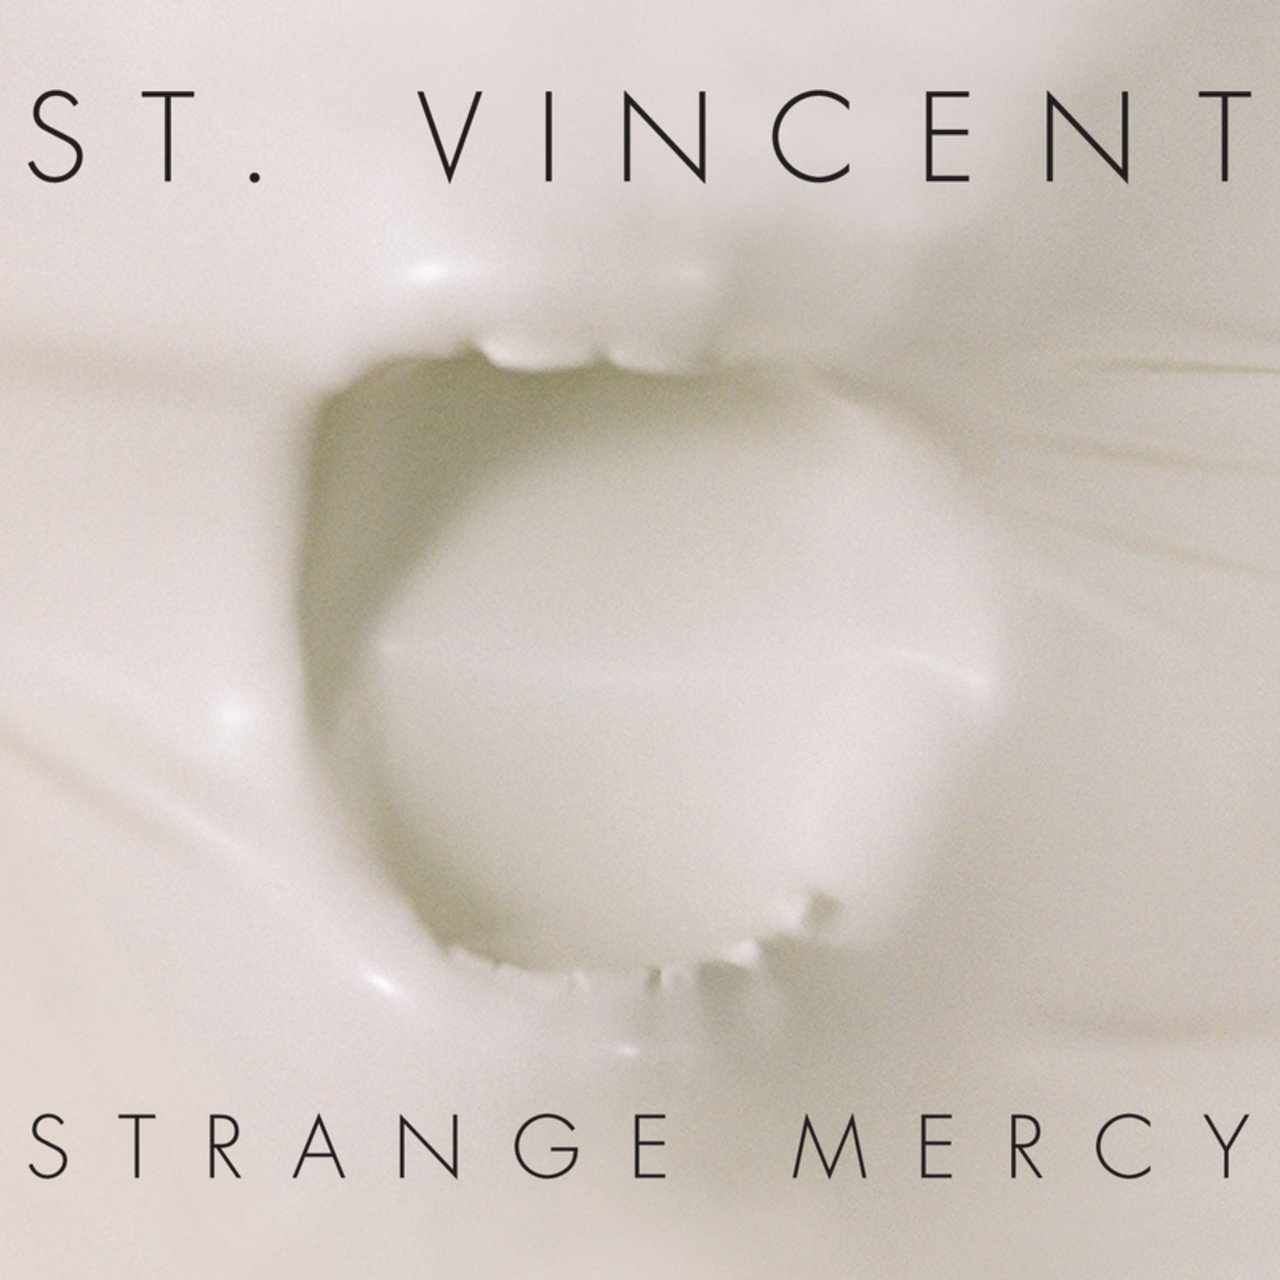 St. Vincent - Strange Mercy [LP]